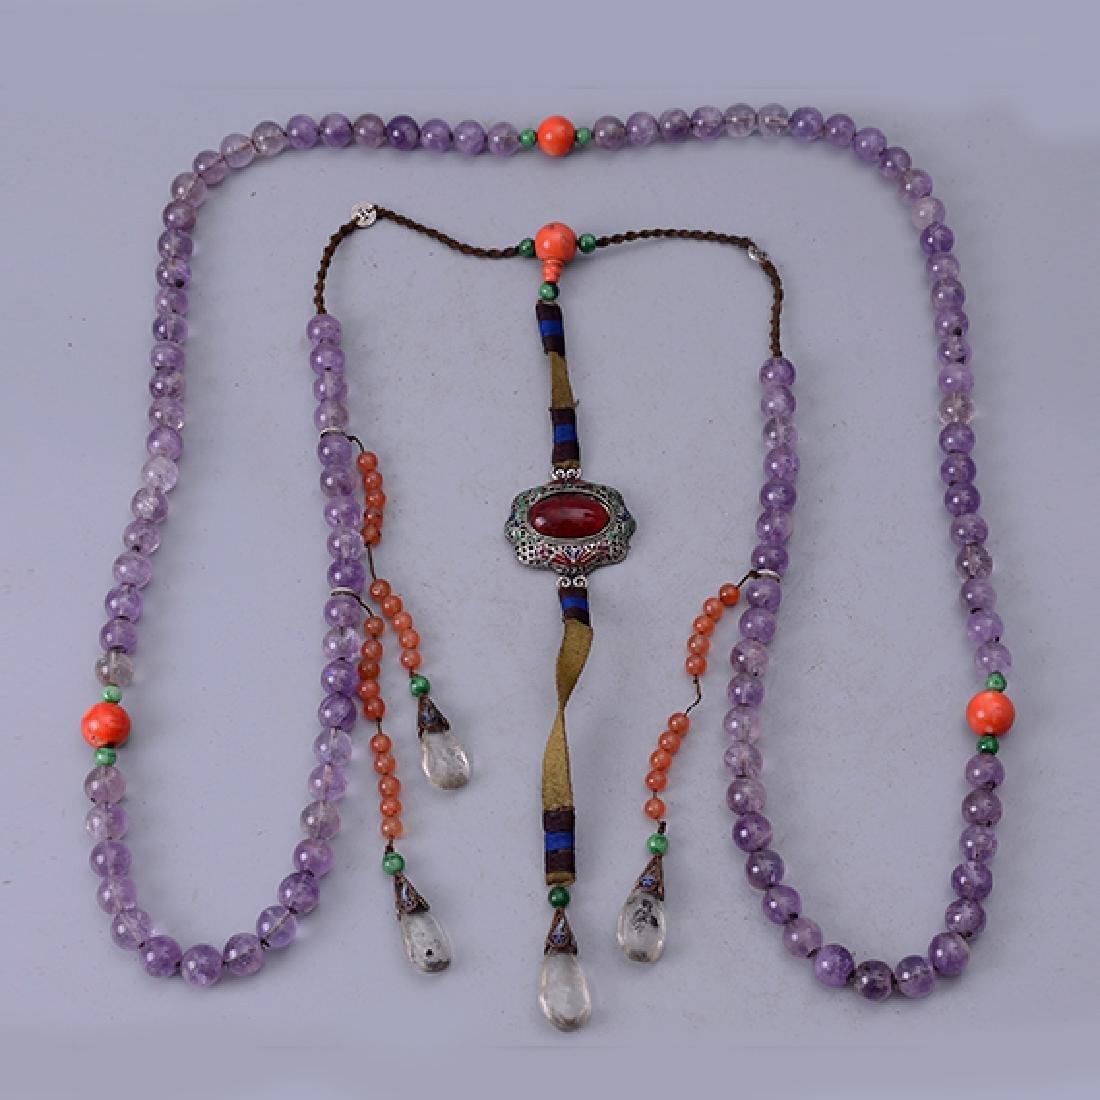 Chinese Amethyst Bracelet